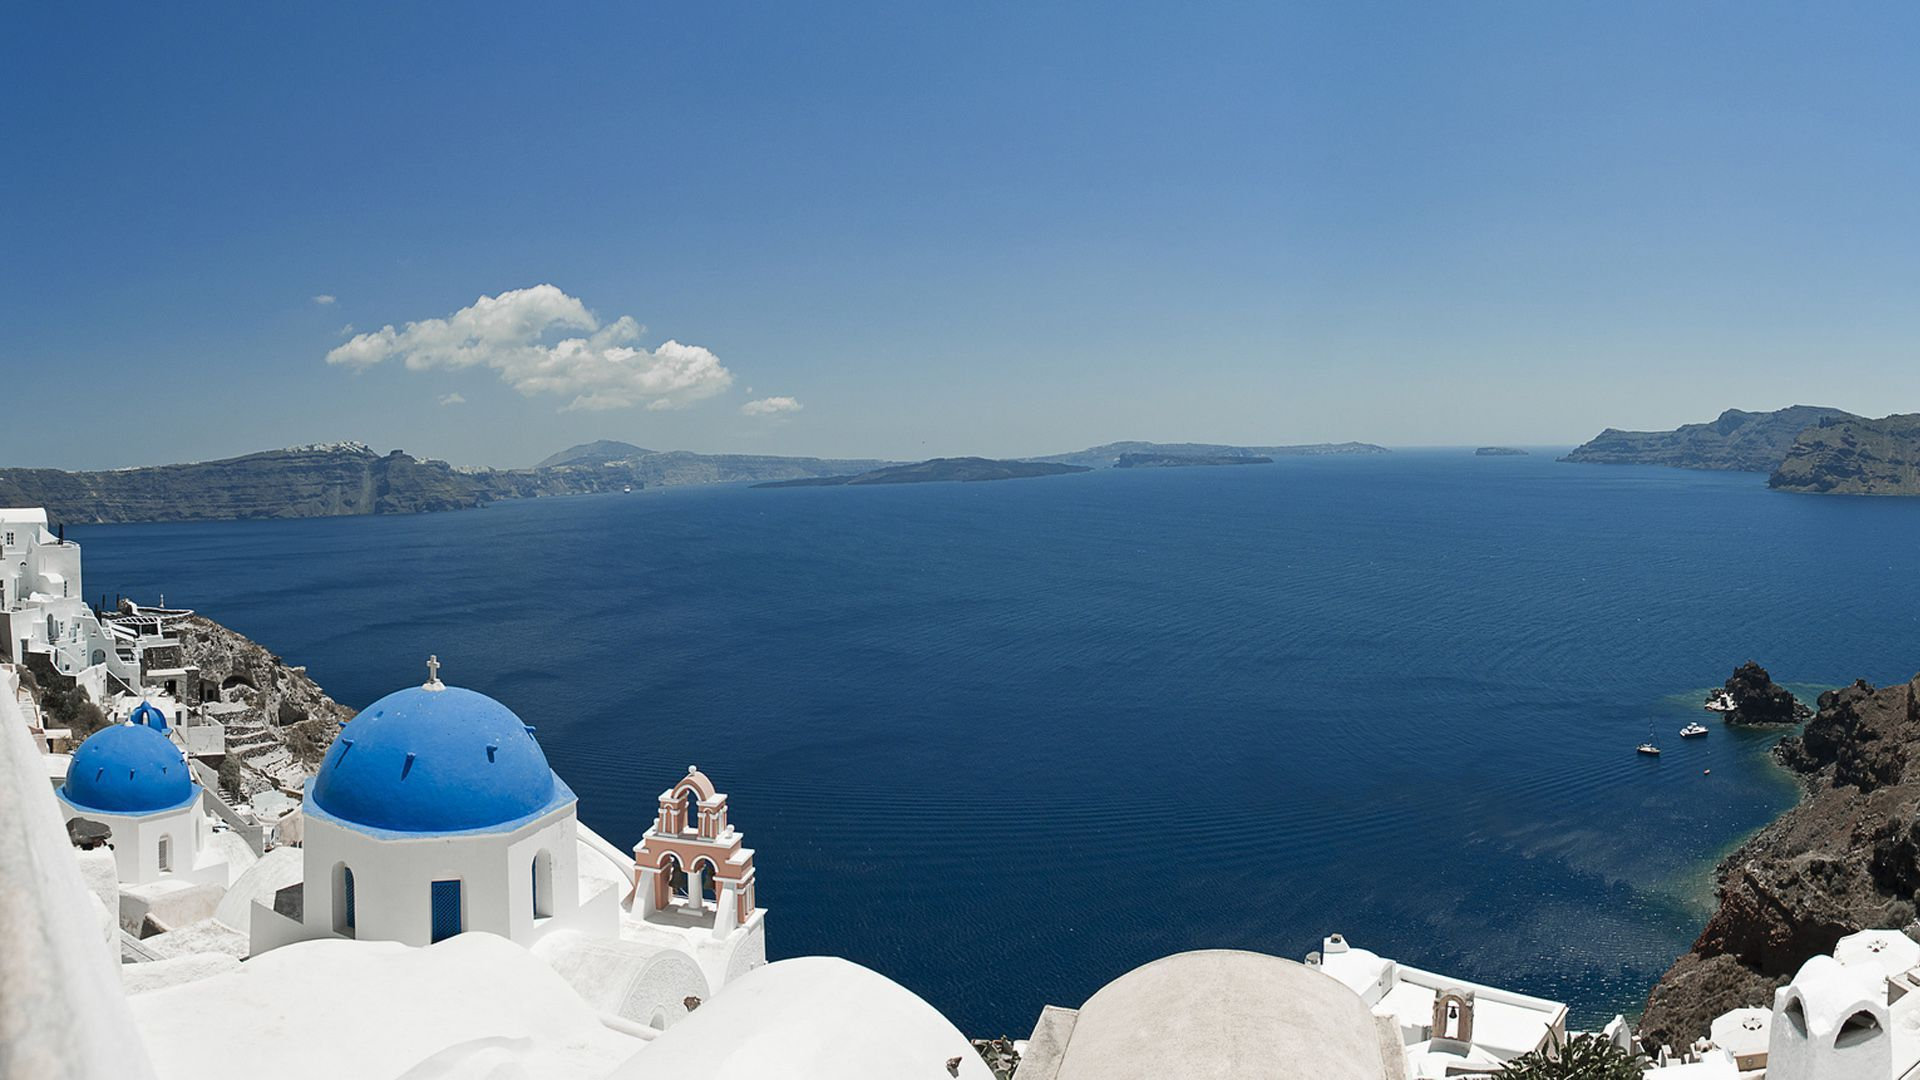 Santorini hd wallpaper 1080p for pc